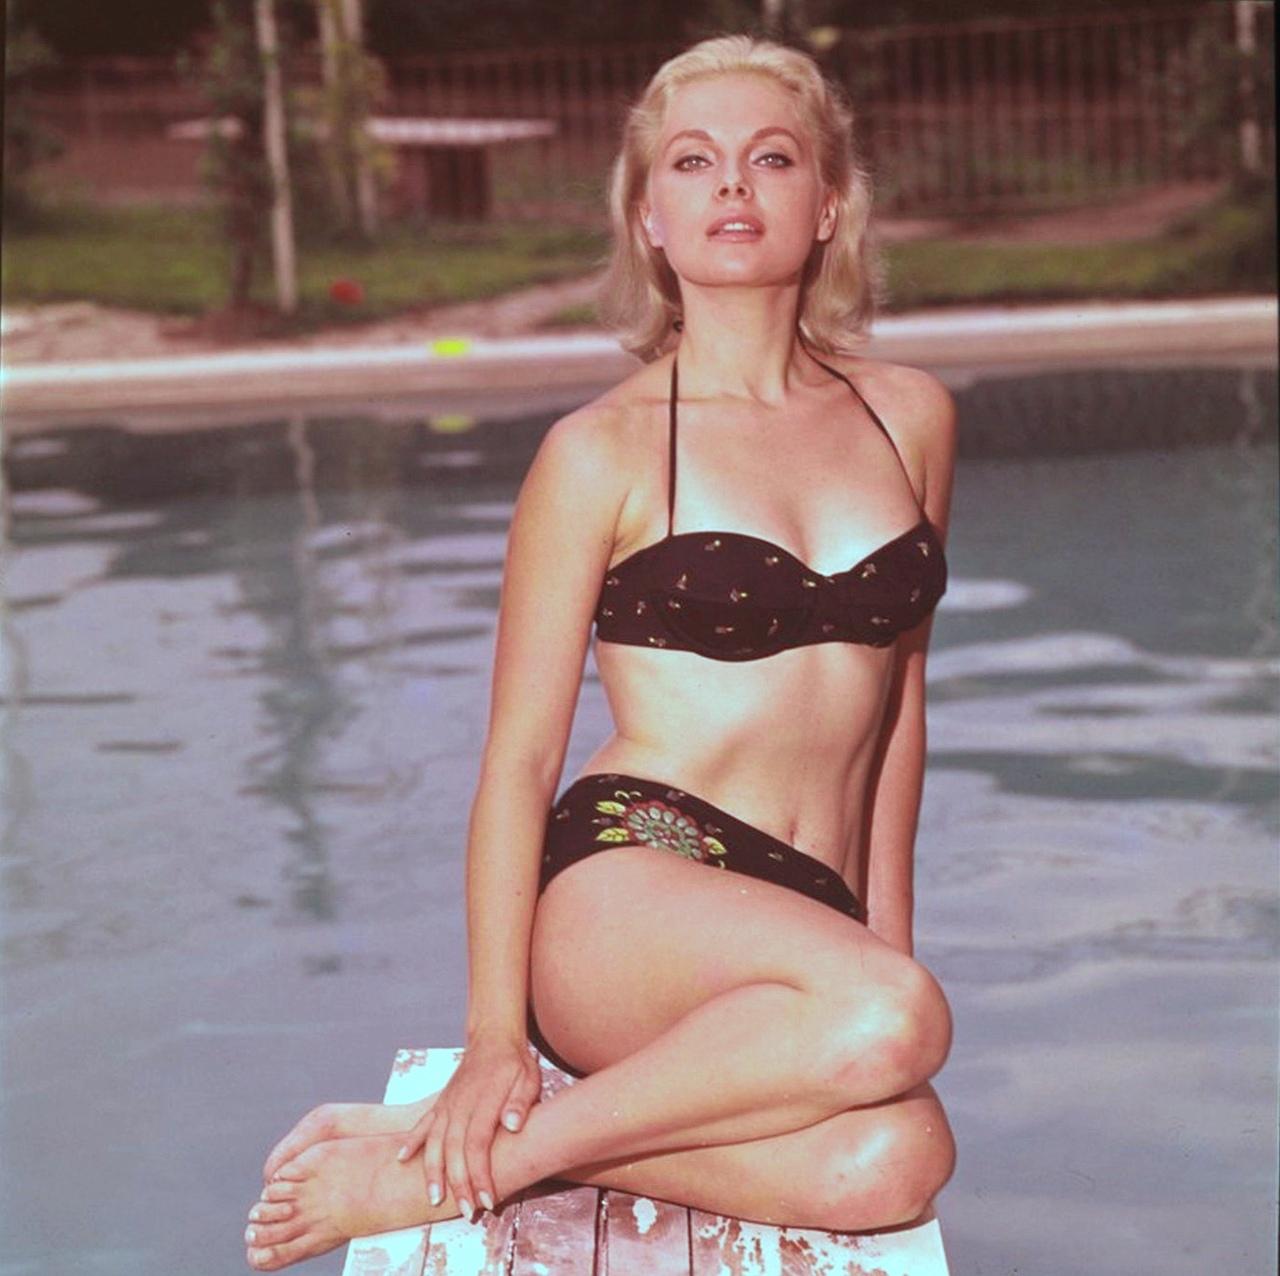 1936-virna-lisi-pool.jpg (1280×1276)